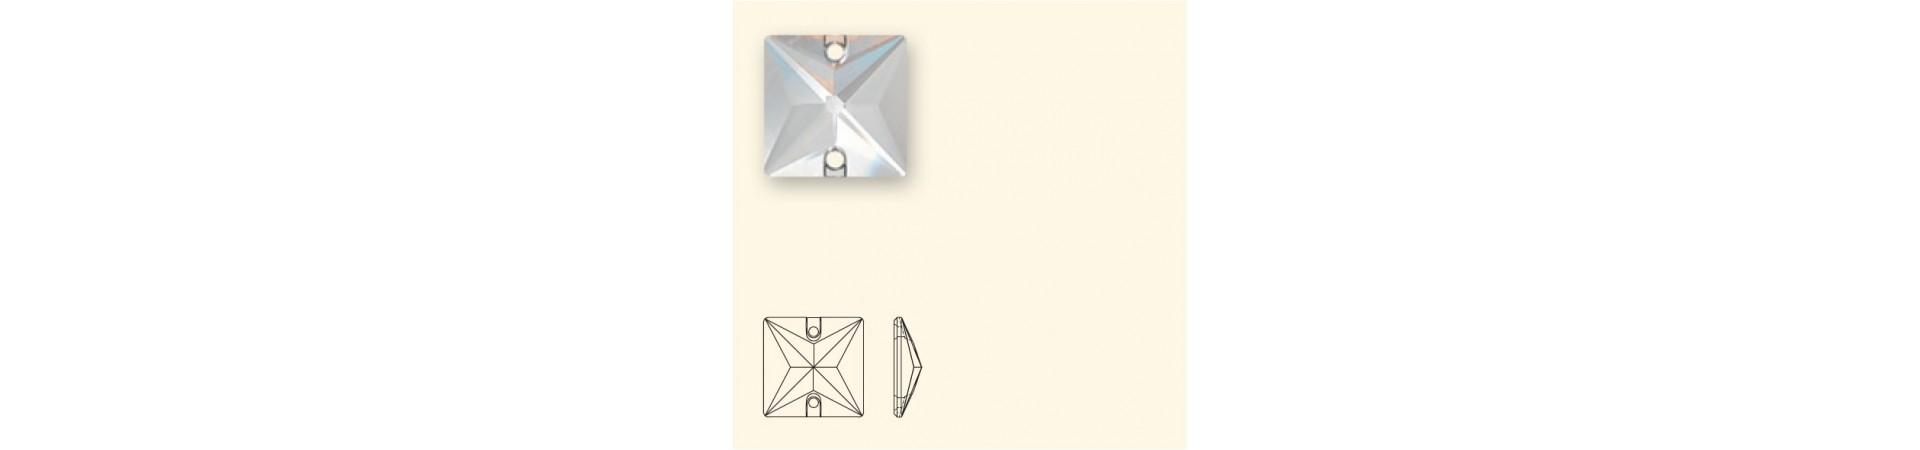 3240 Square (Квадрат) Пришивные Кристаллы